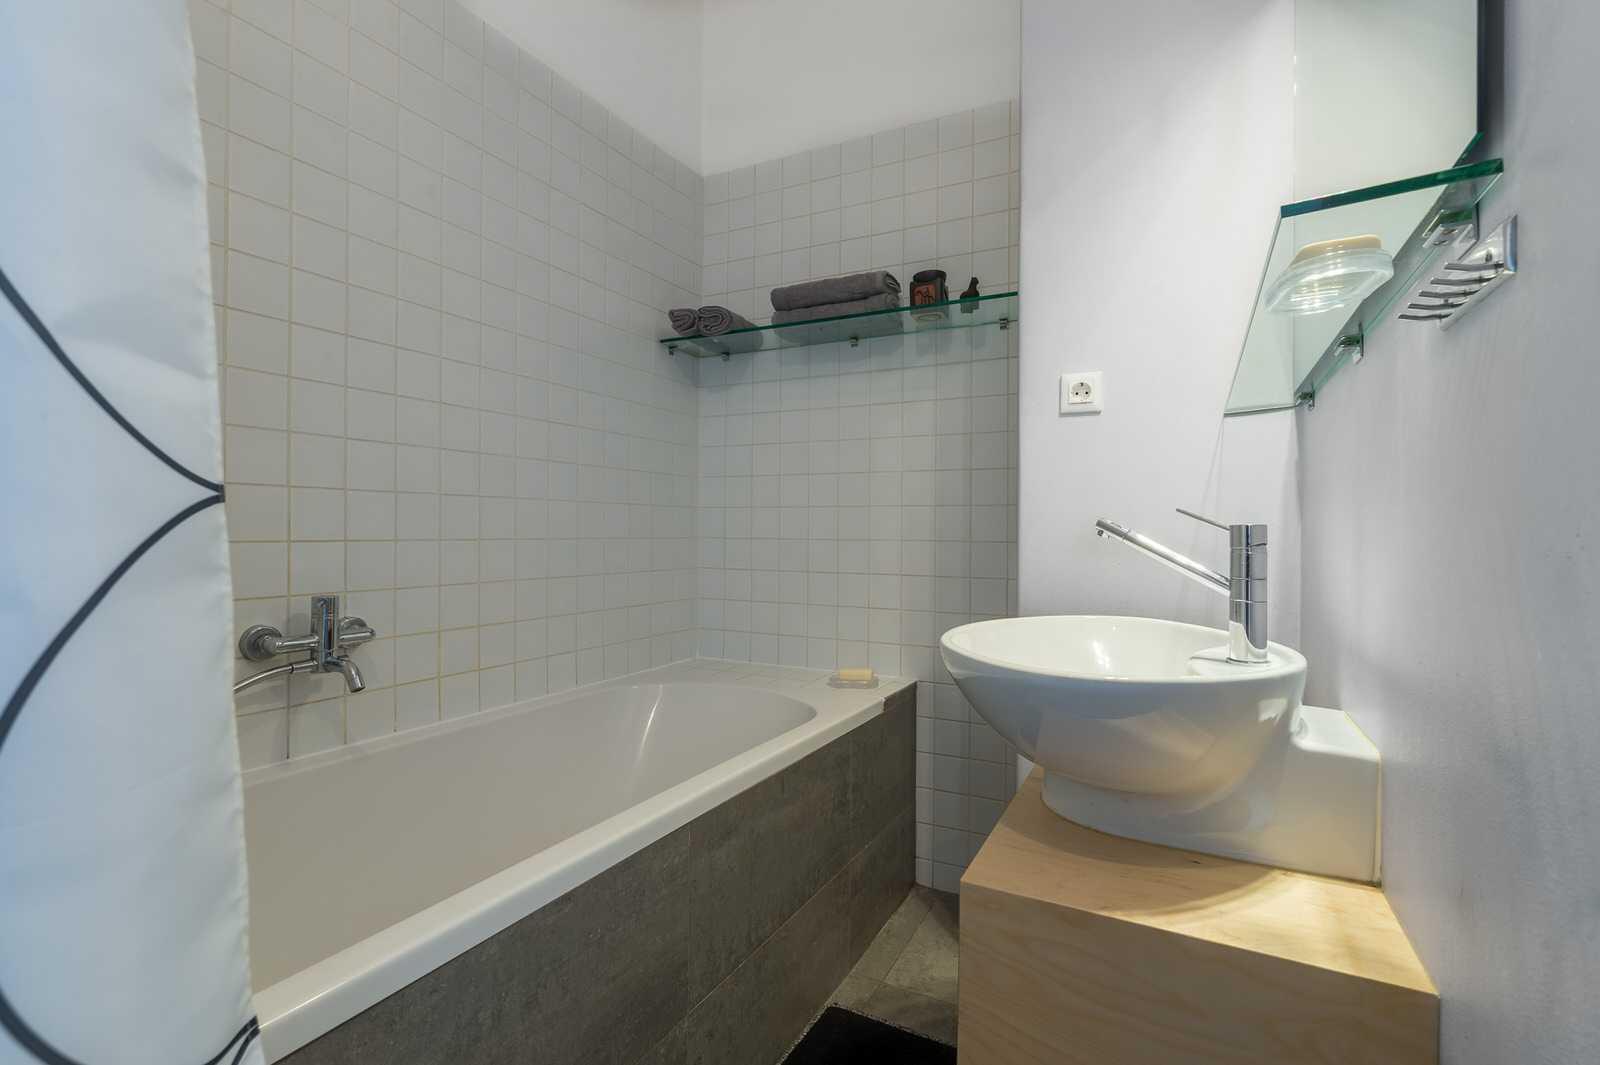 Take a bath in this modern bathroom.